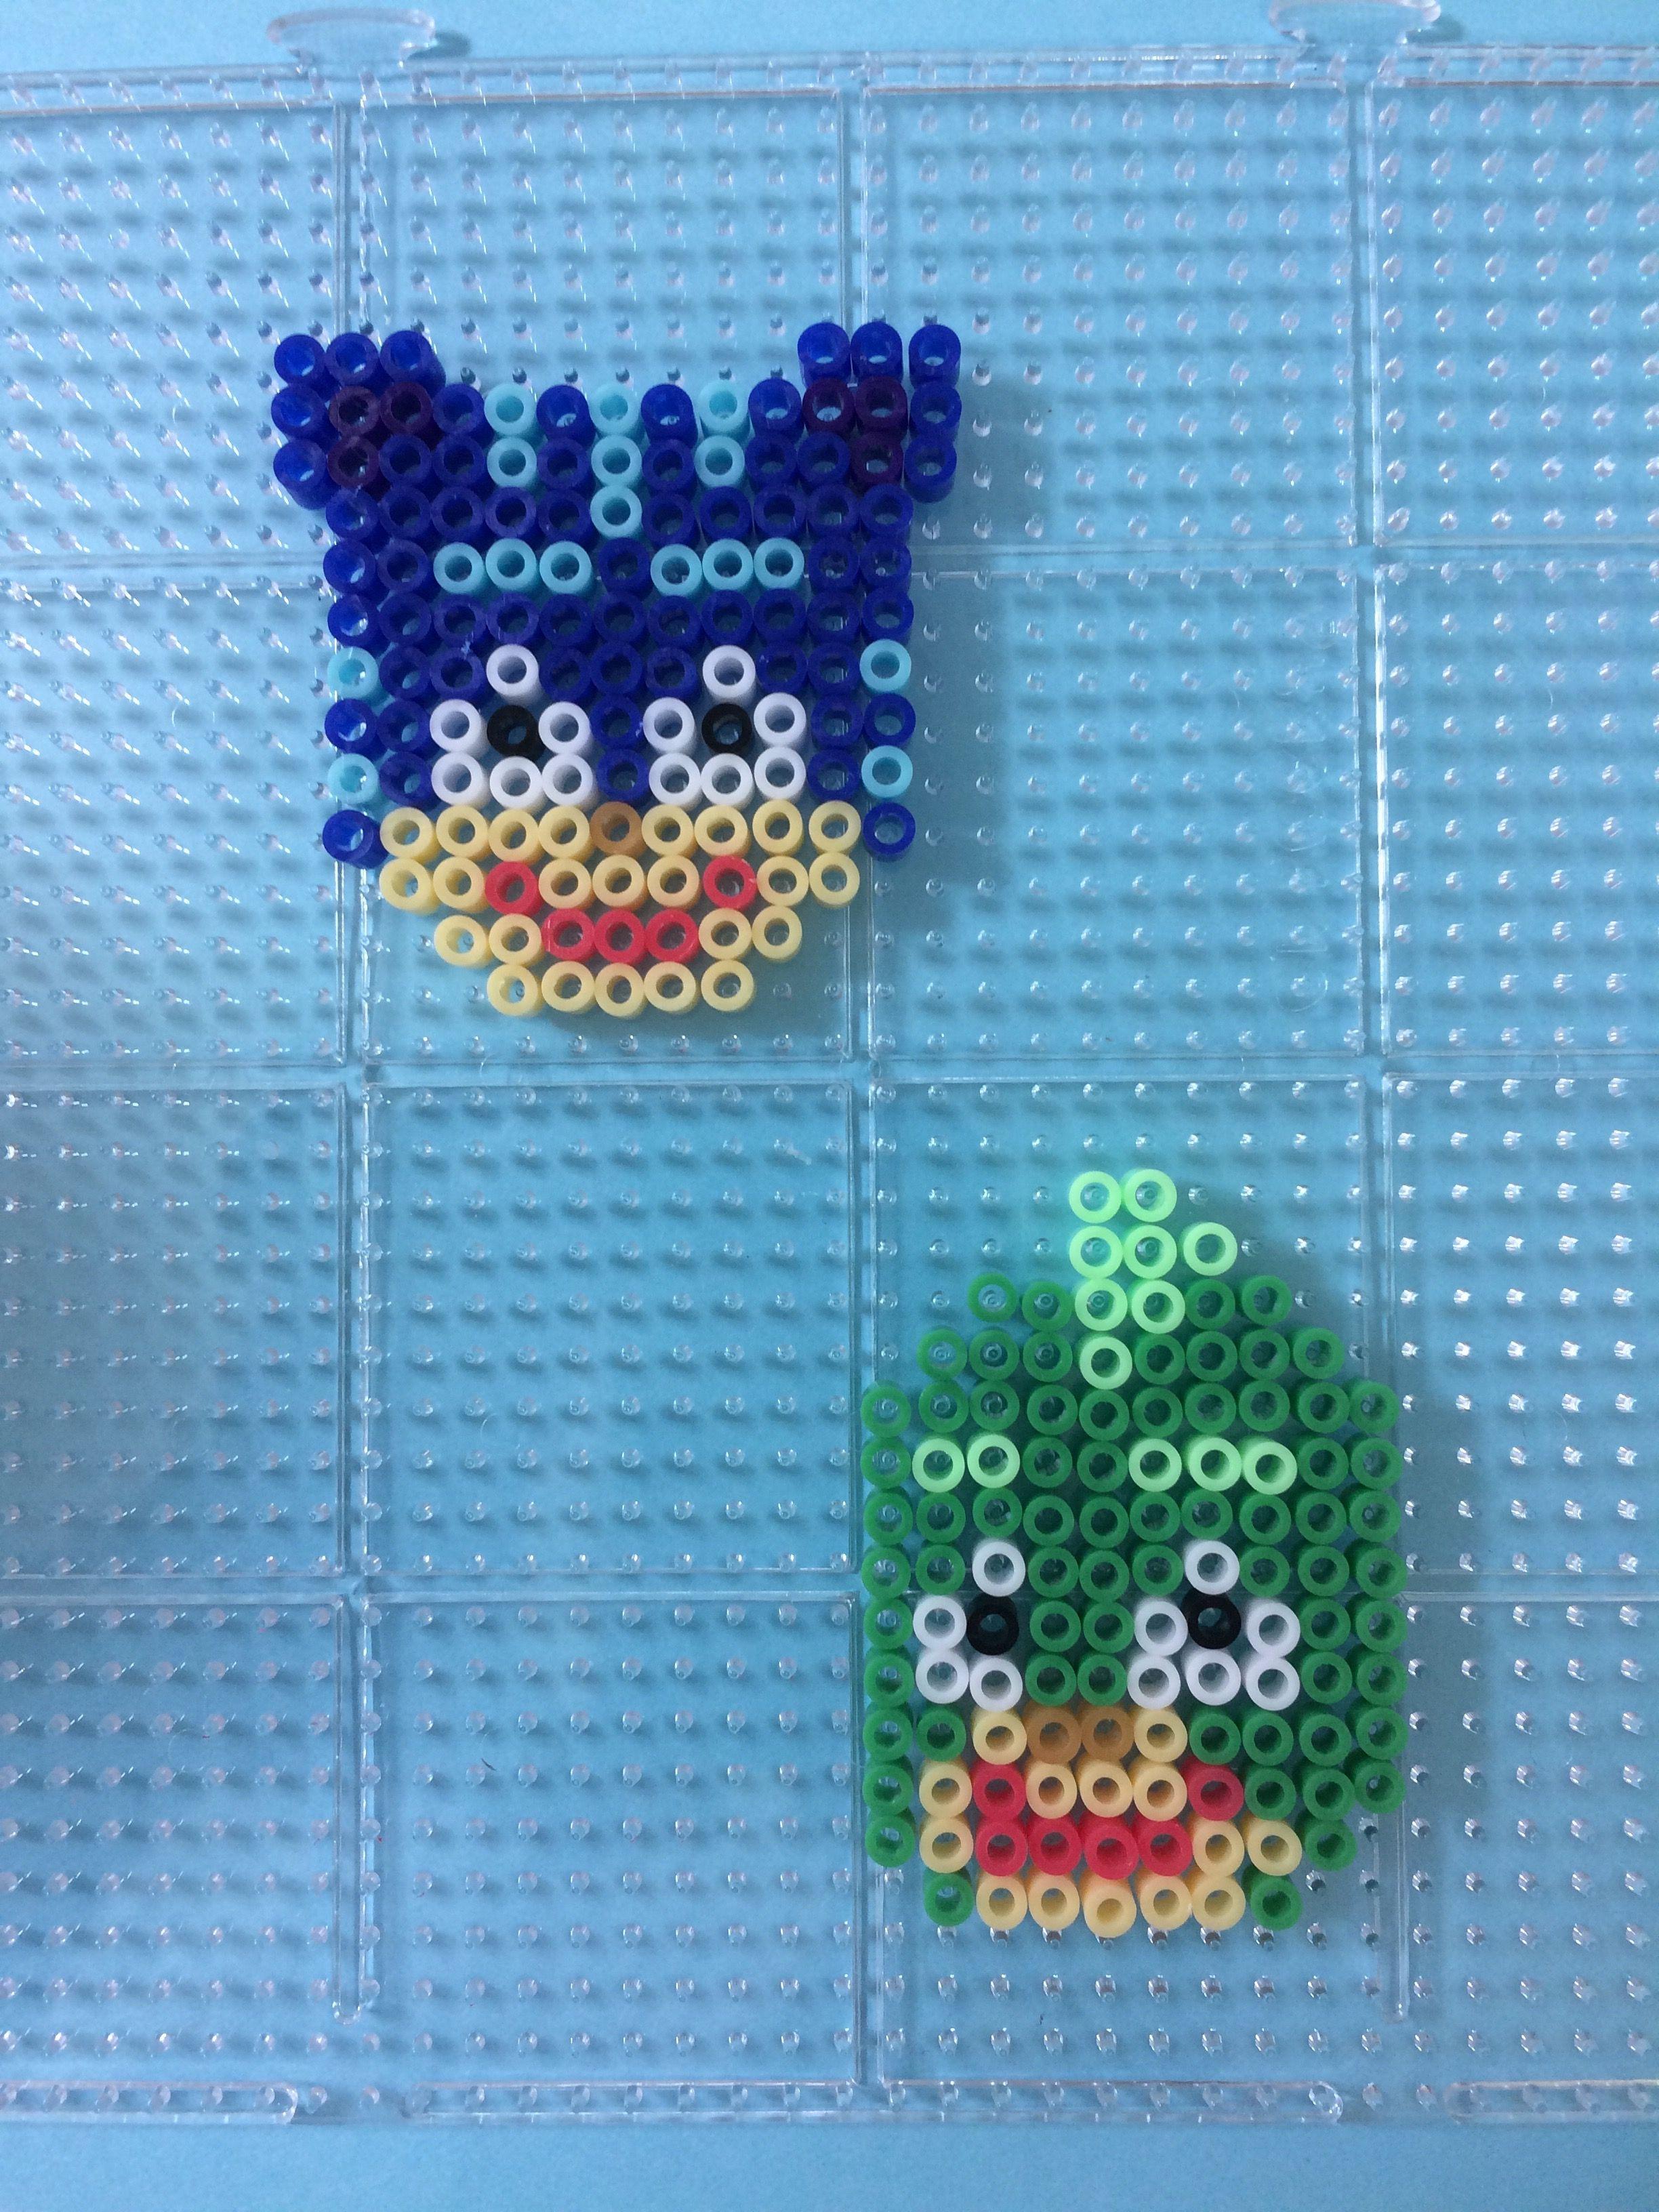 PJ masks catboy, gekko perler beads | Perler beads | Pinterest ...